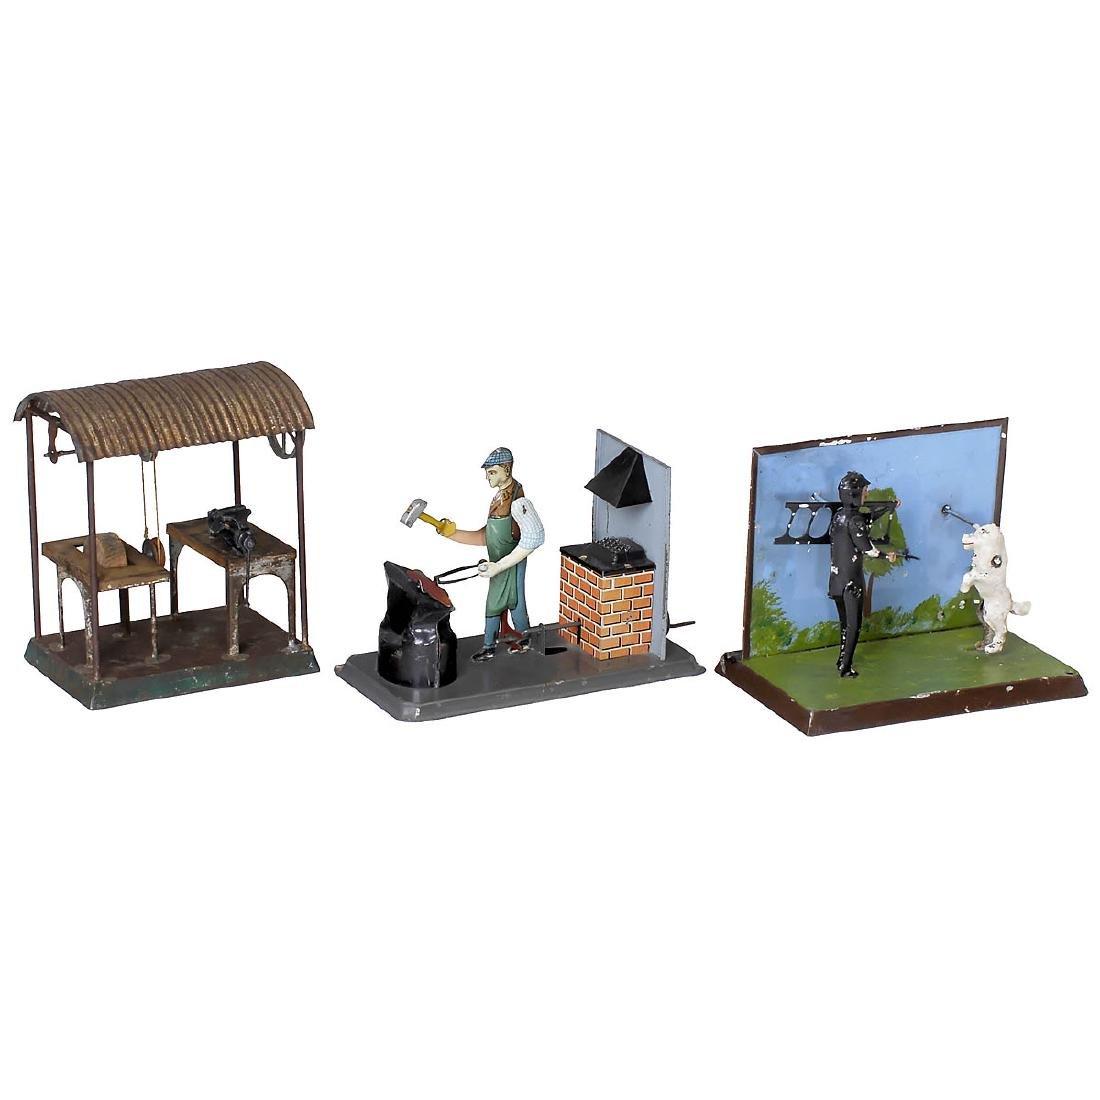 3 Steam Toys